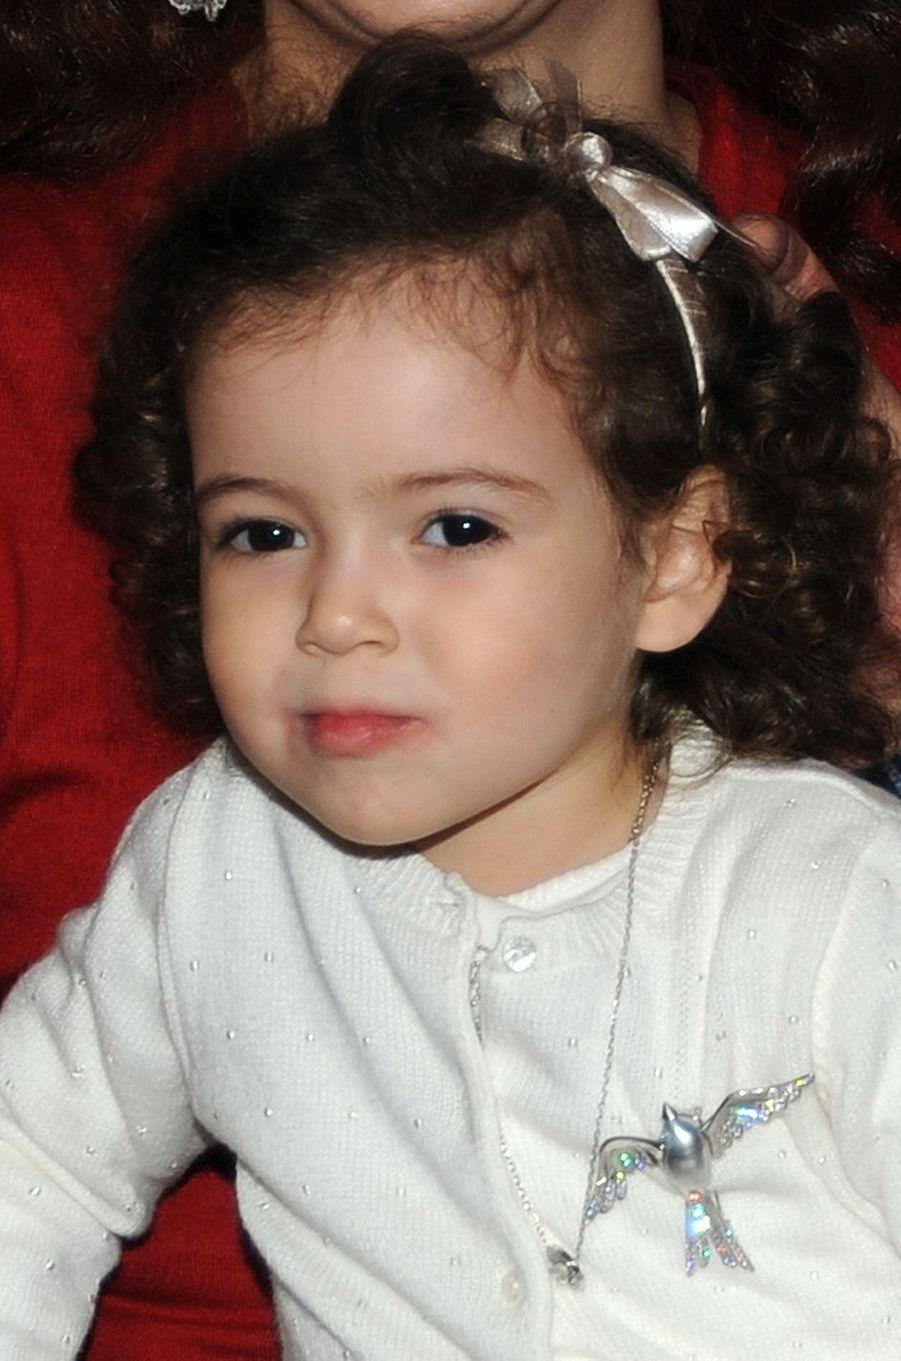 La princesse Lalla Khadija du Maroc, le 28 février 2009